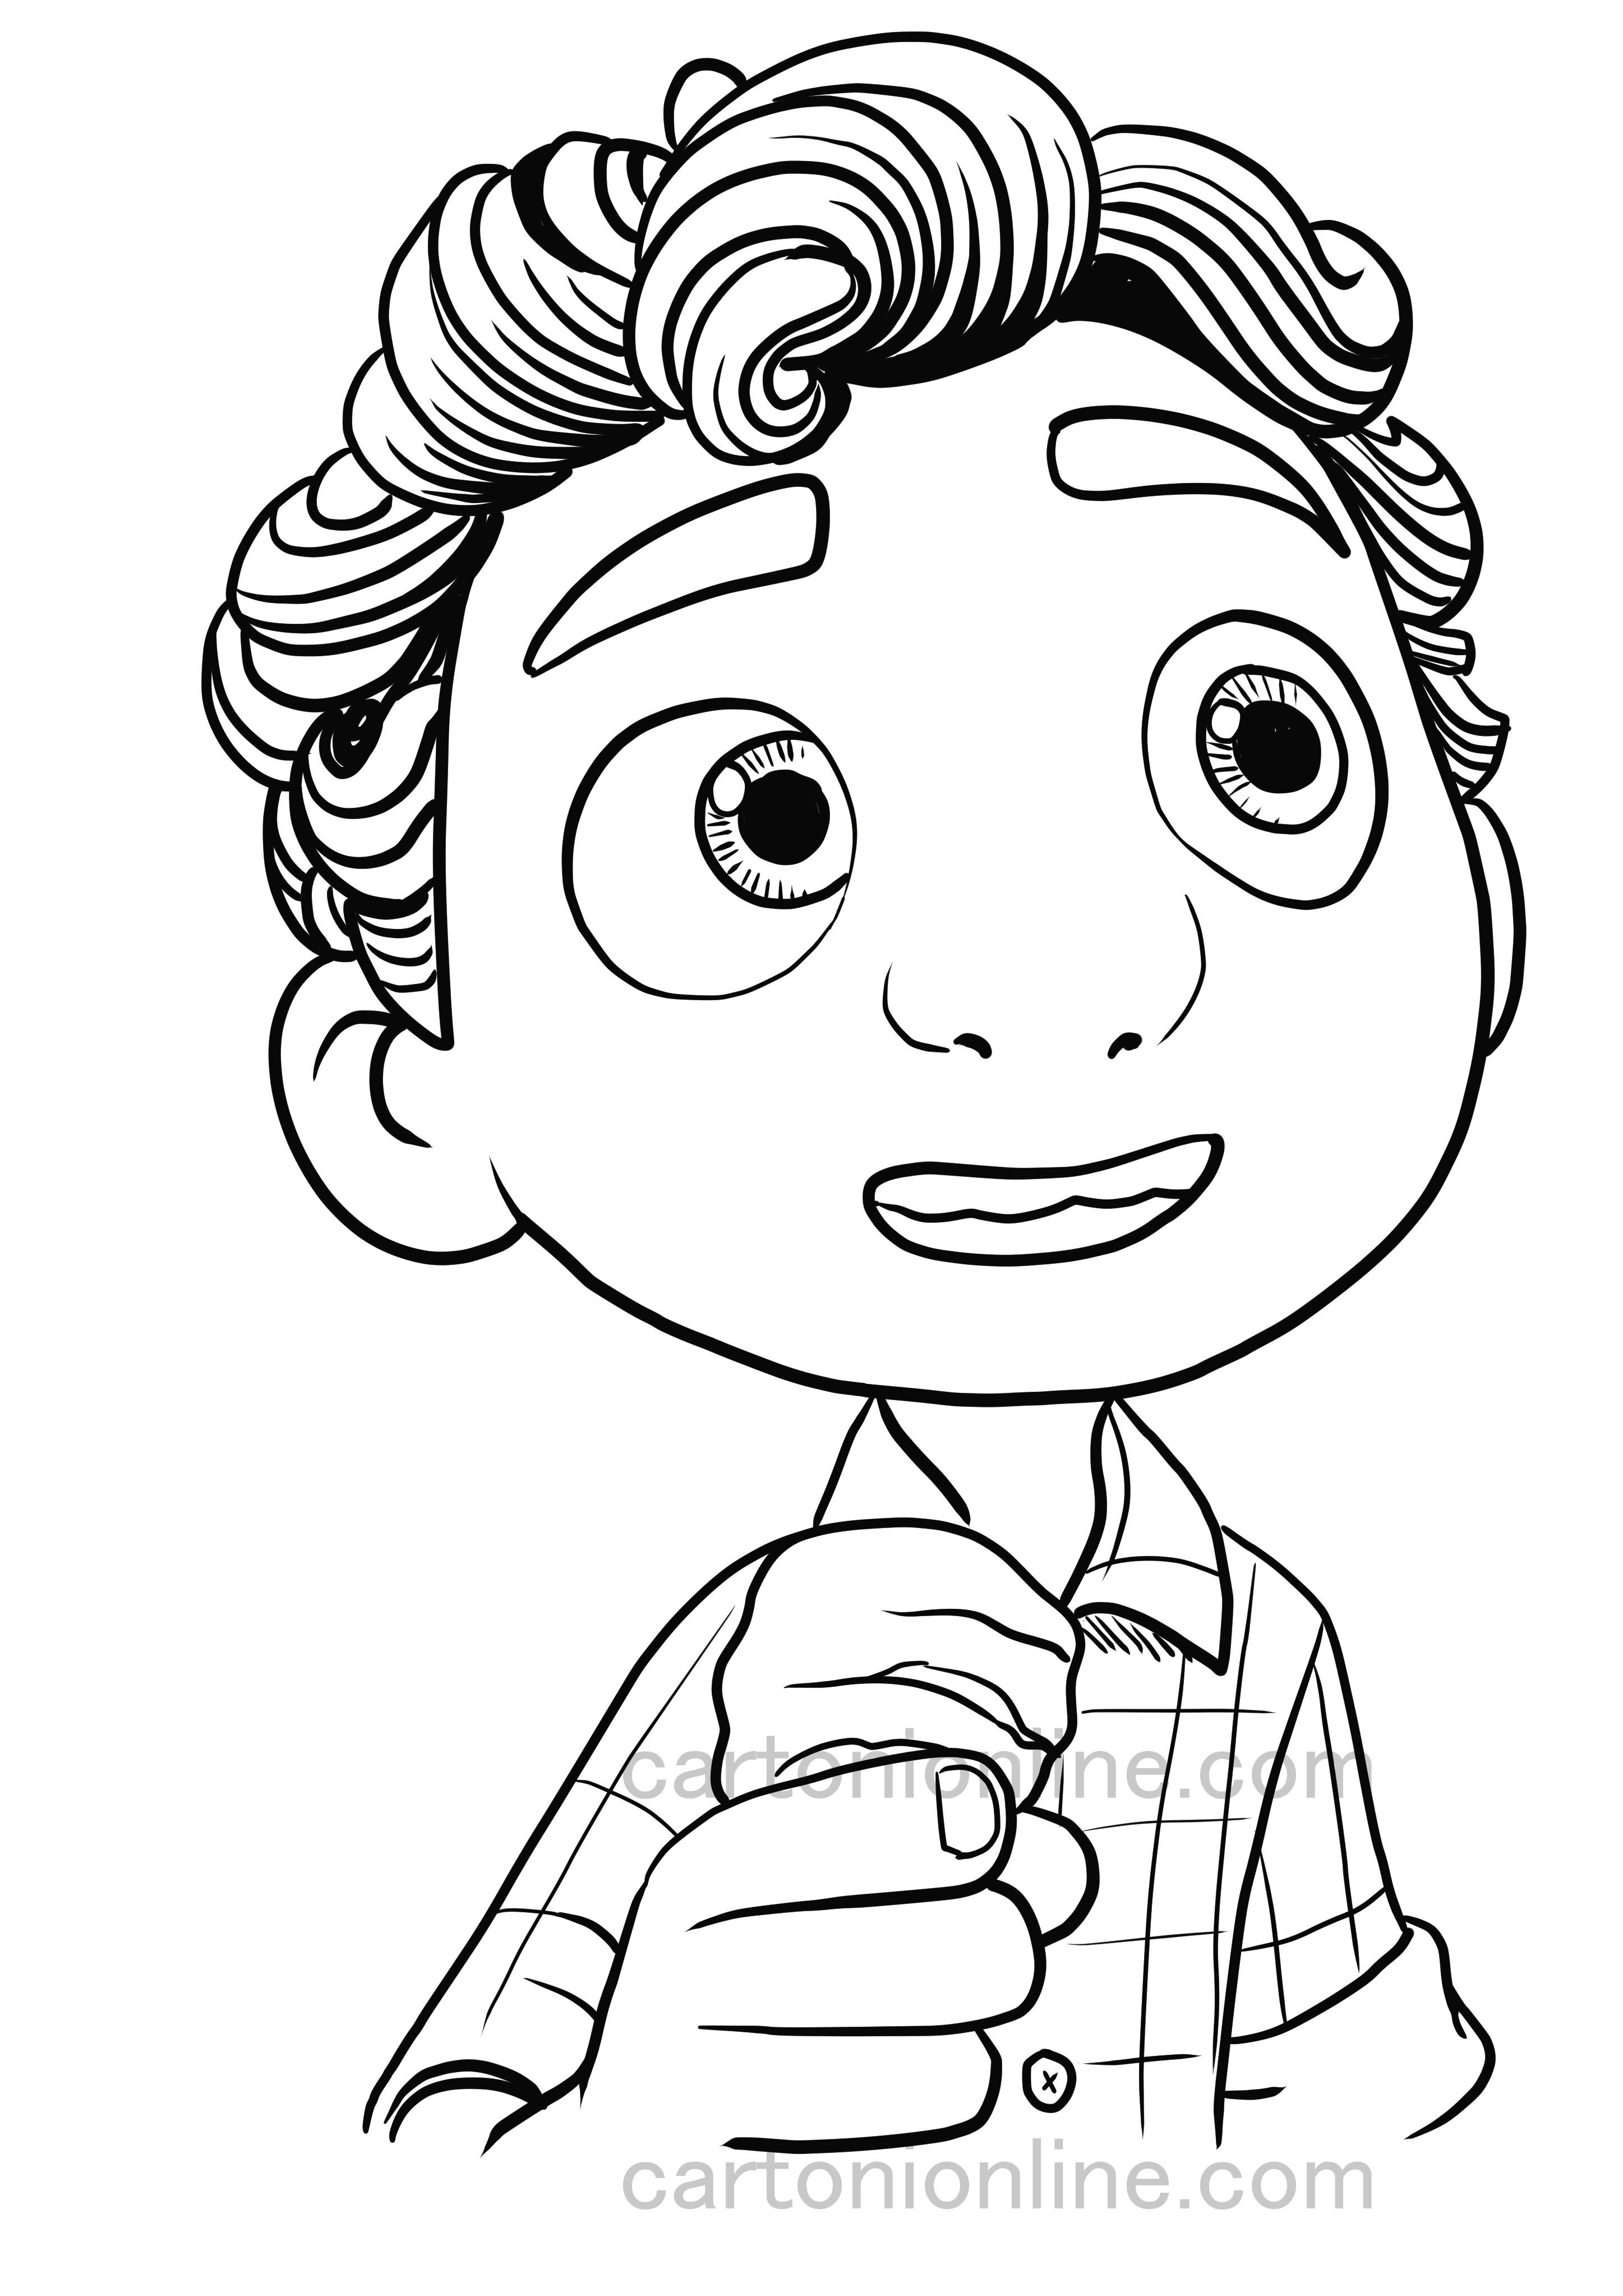 Desenho de Luca Paguro de Luca, 또는 Disney Pixar에서 imprimir 및 colorir에 이르는 영화